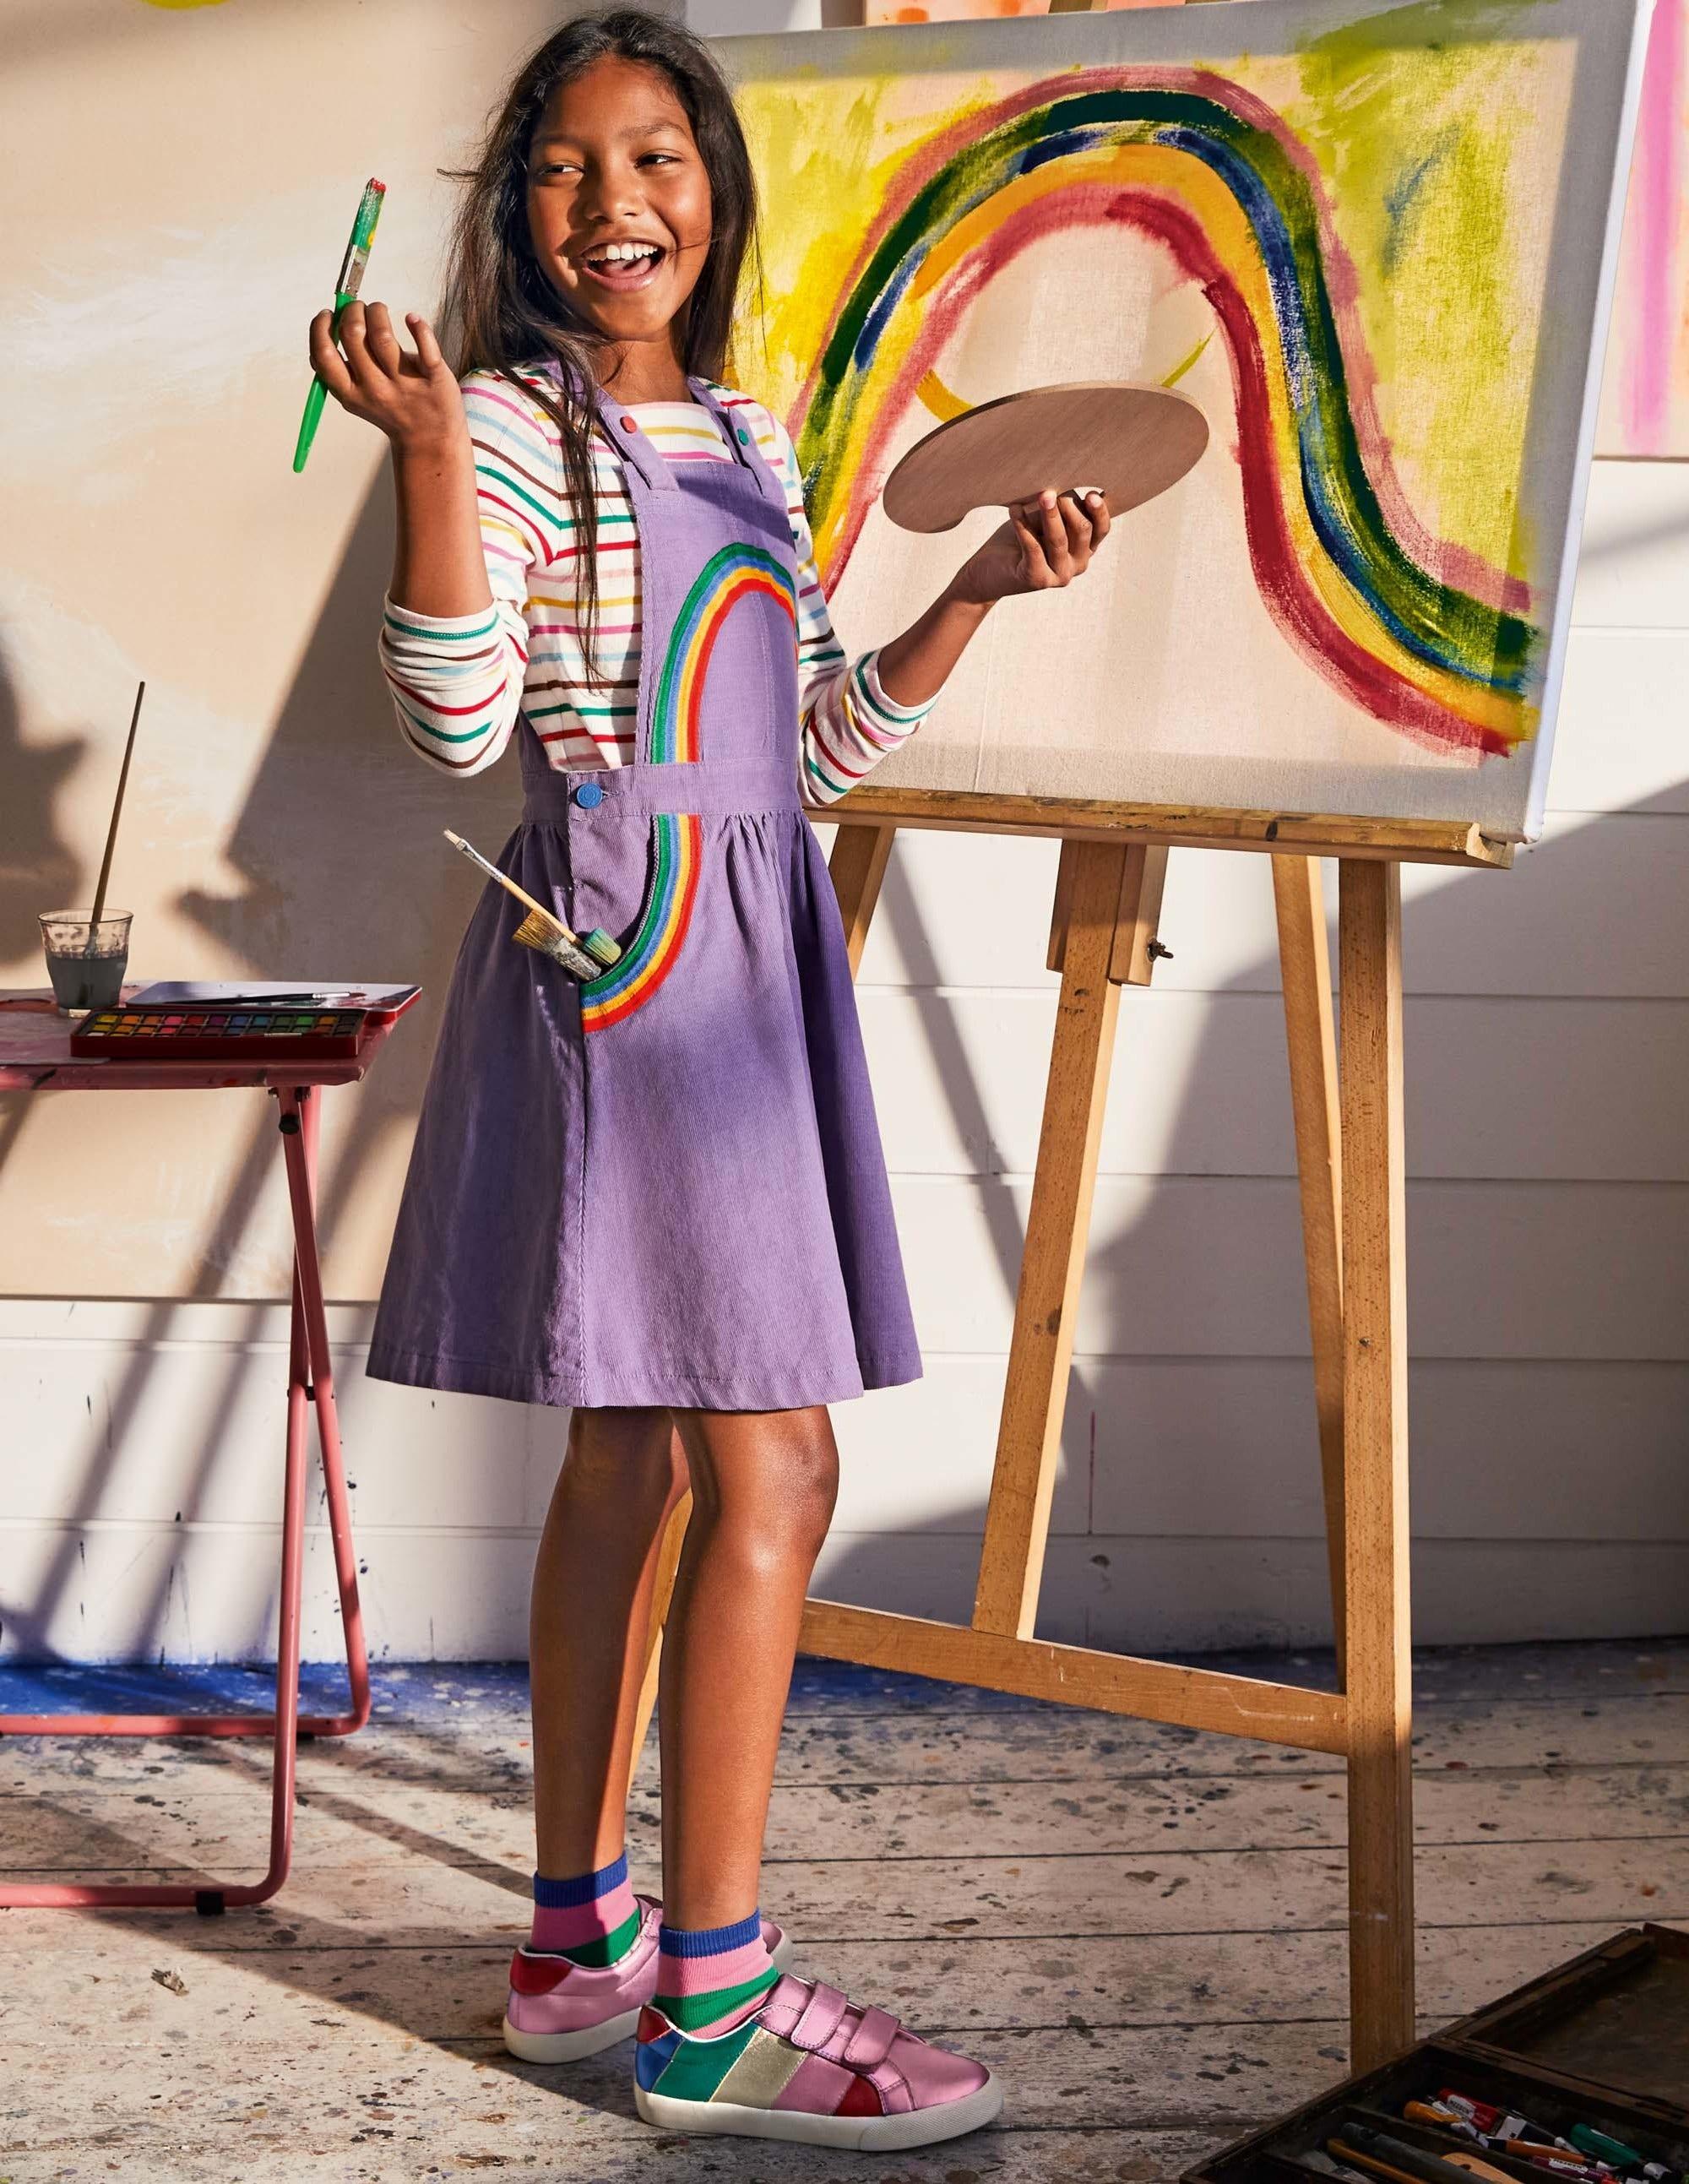 Boden Woven Pinafore Dress - Aster Purple Rainbow